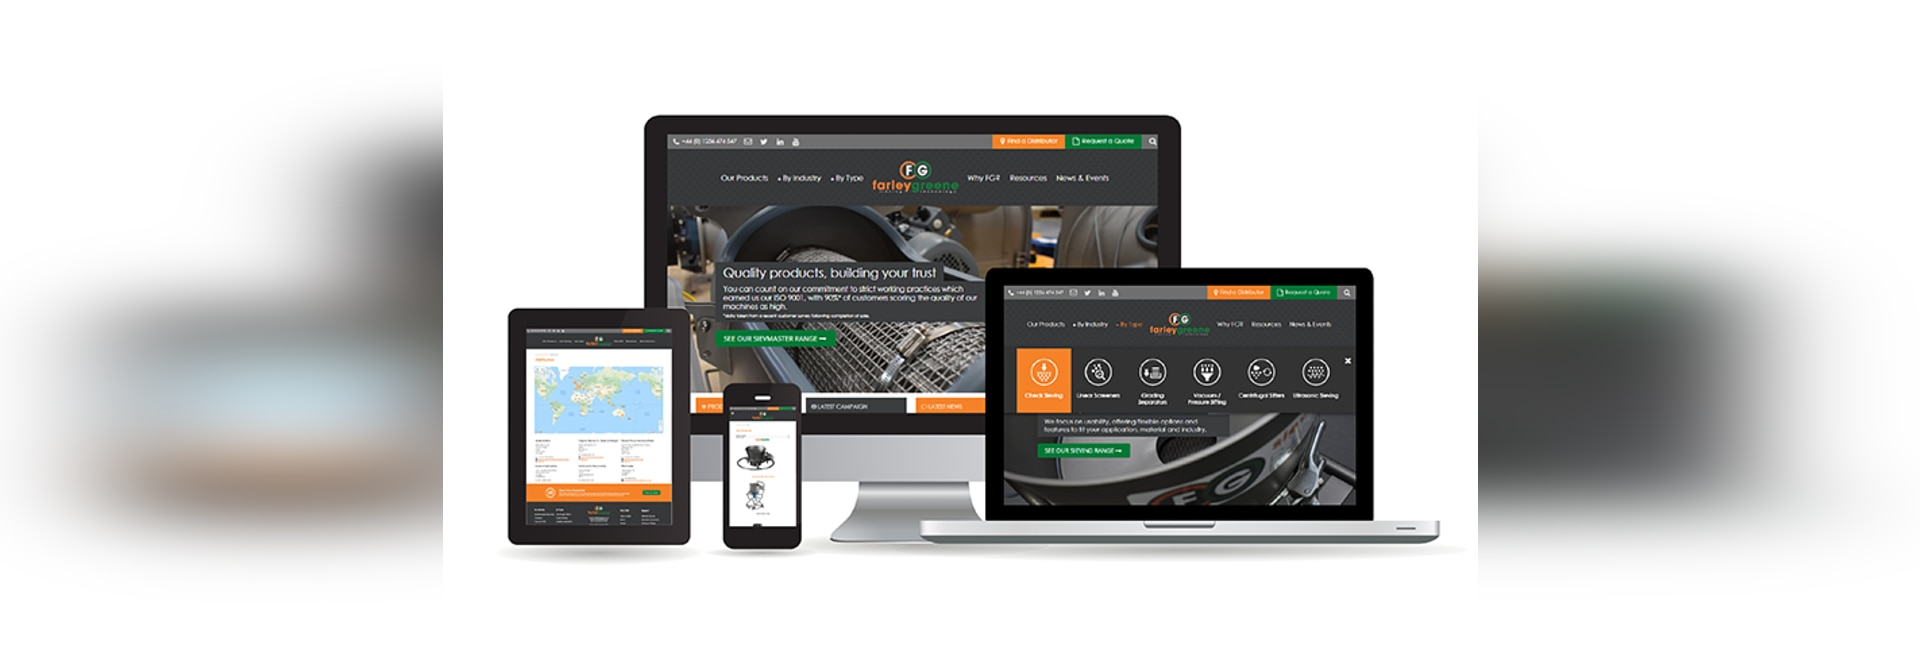 Farleygreene Launches New Website